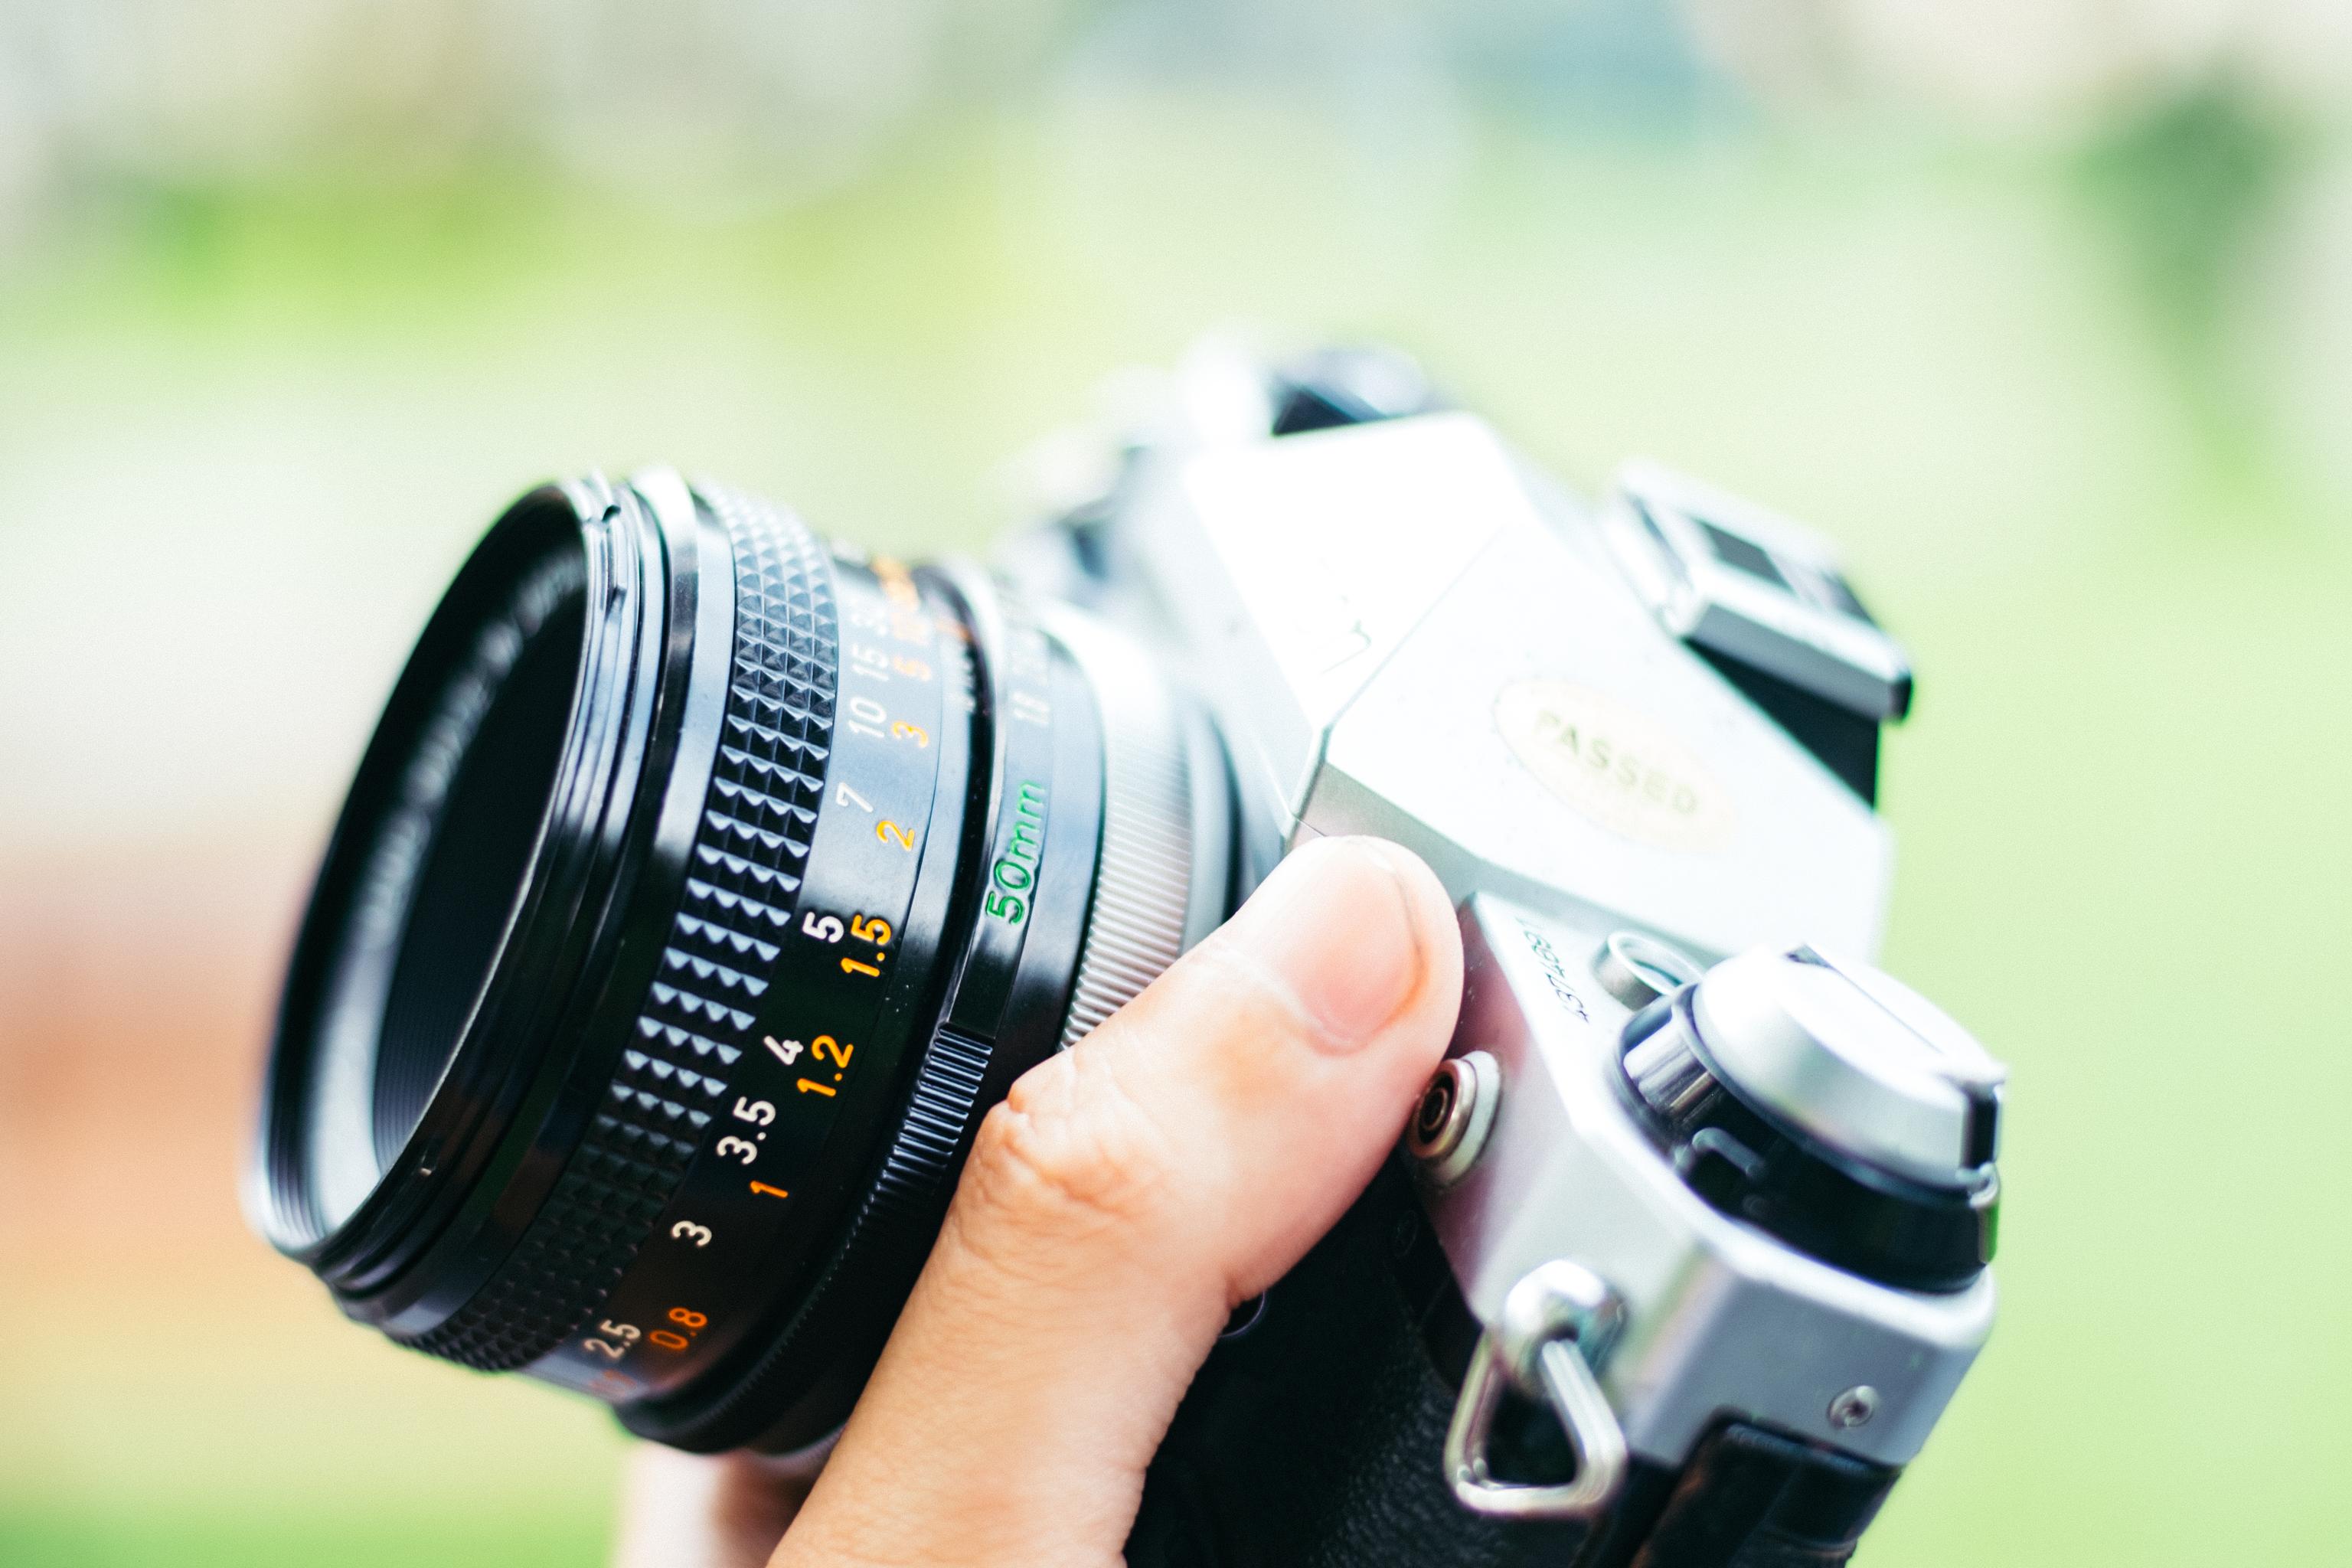 Объектив фотоаппарата картинки